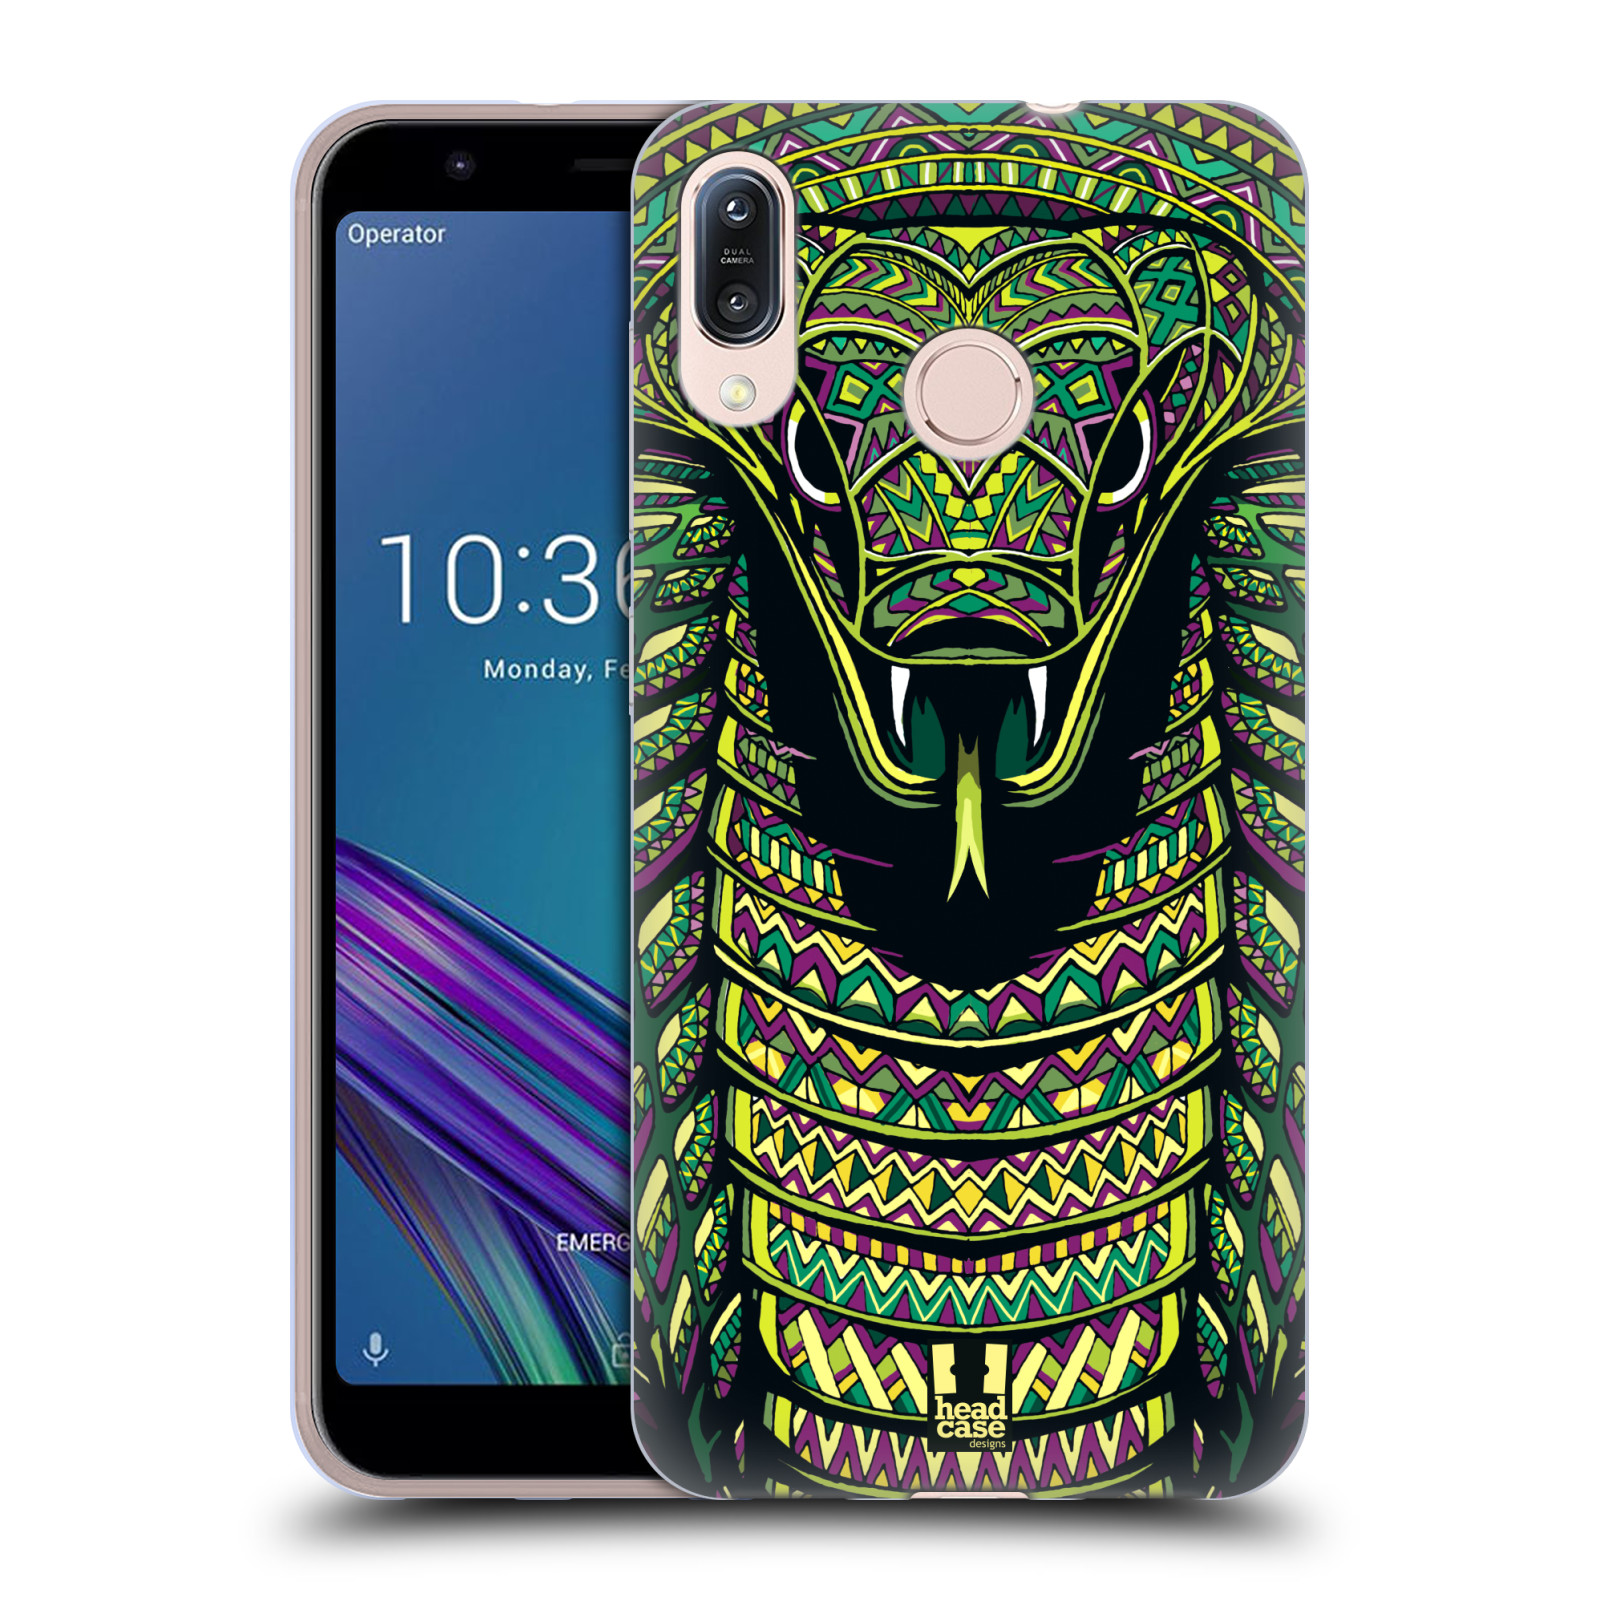 Silikonové pouzdro na mobil Asus Zenfone Max M1 ZB555KL - Head Case - AZTEC HAD